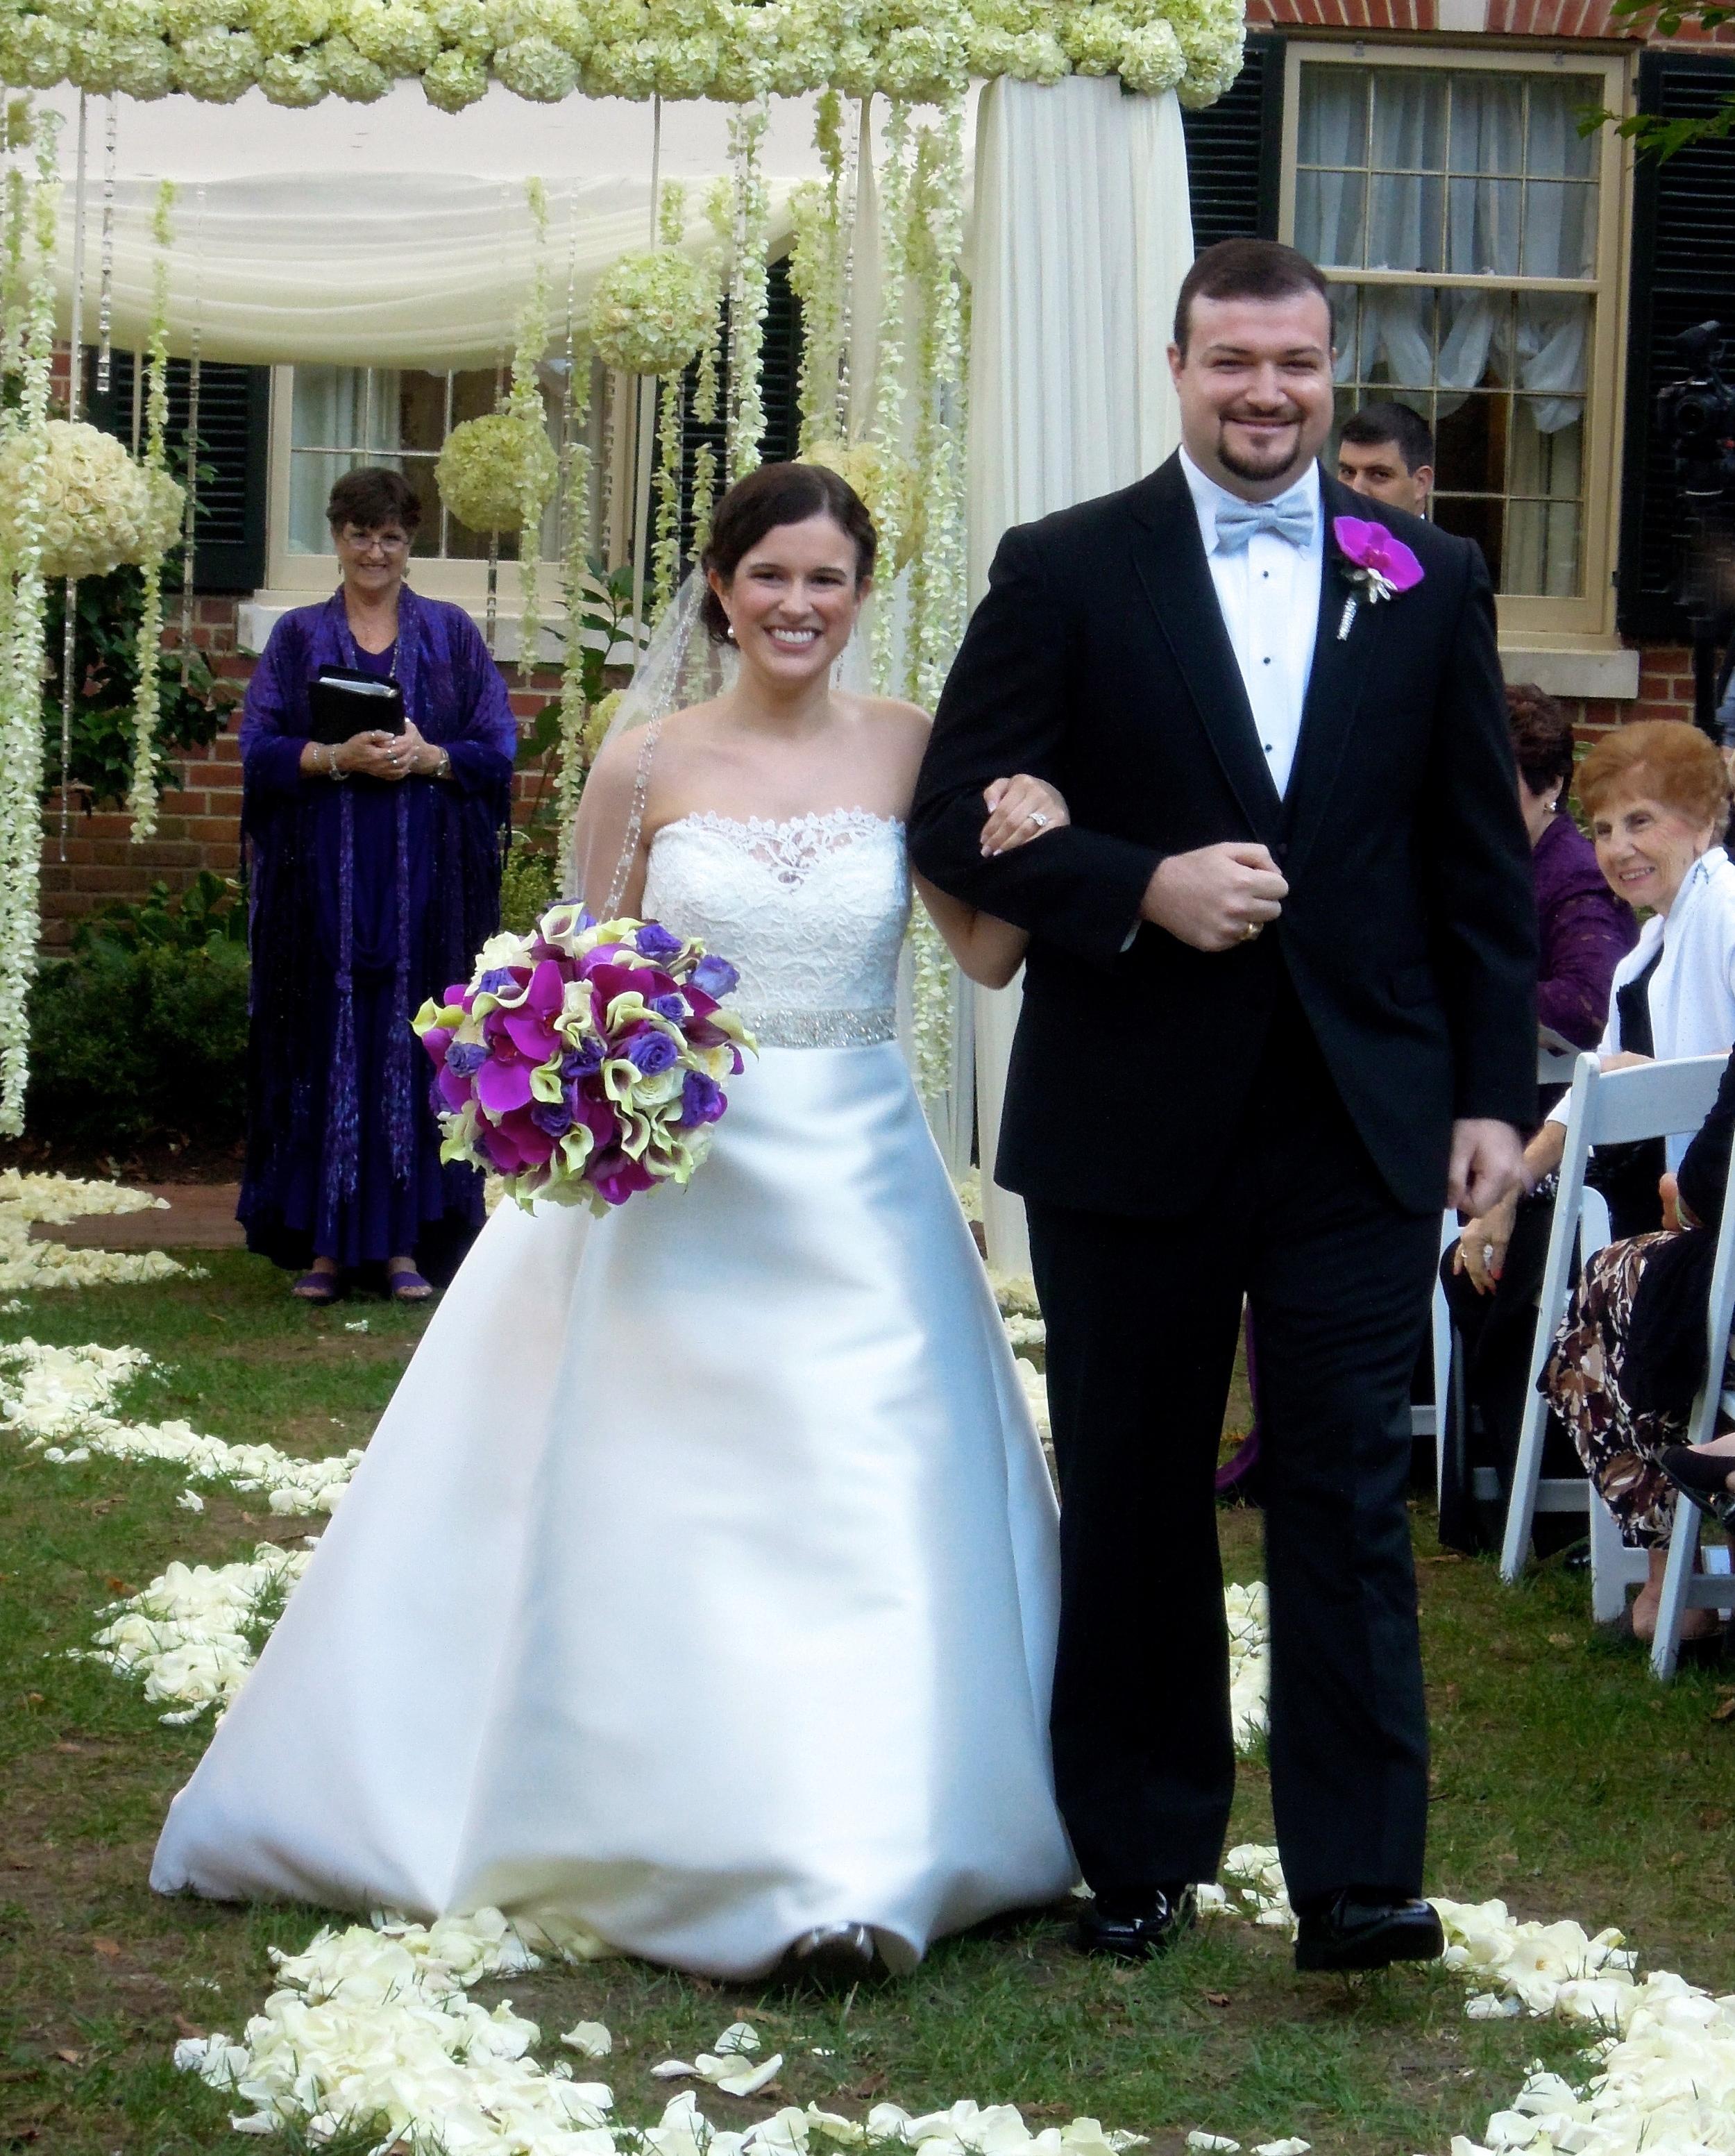 Spectacular Interfaith Wedding at The Carolina Inn, Chapel Hill NC